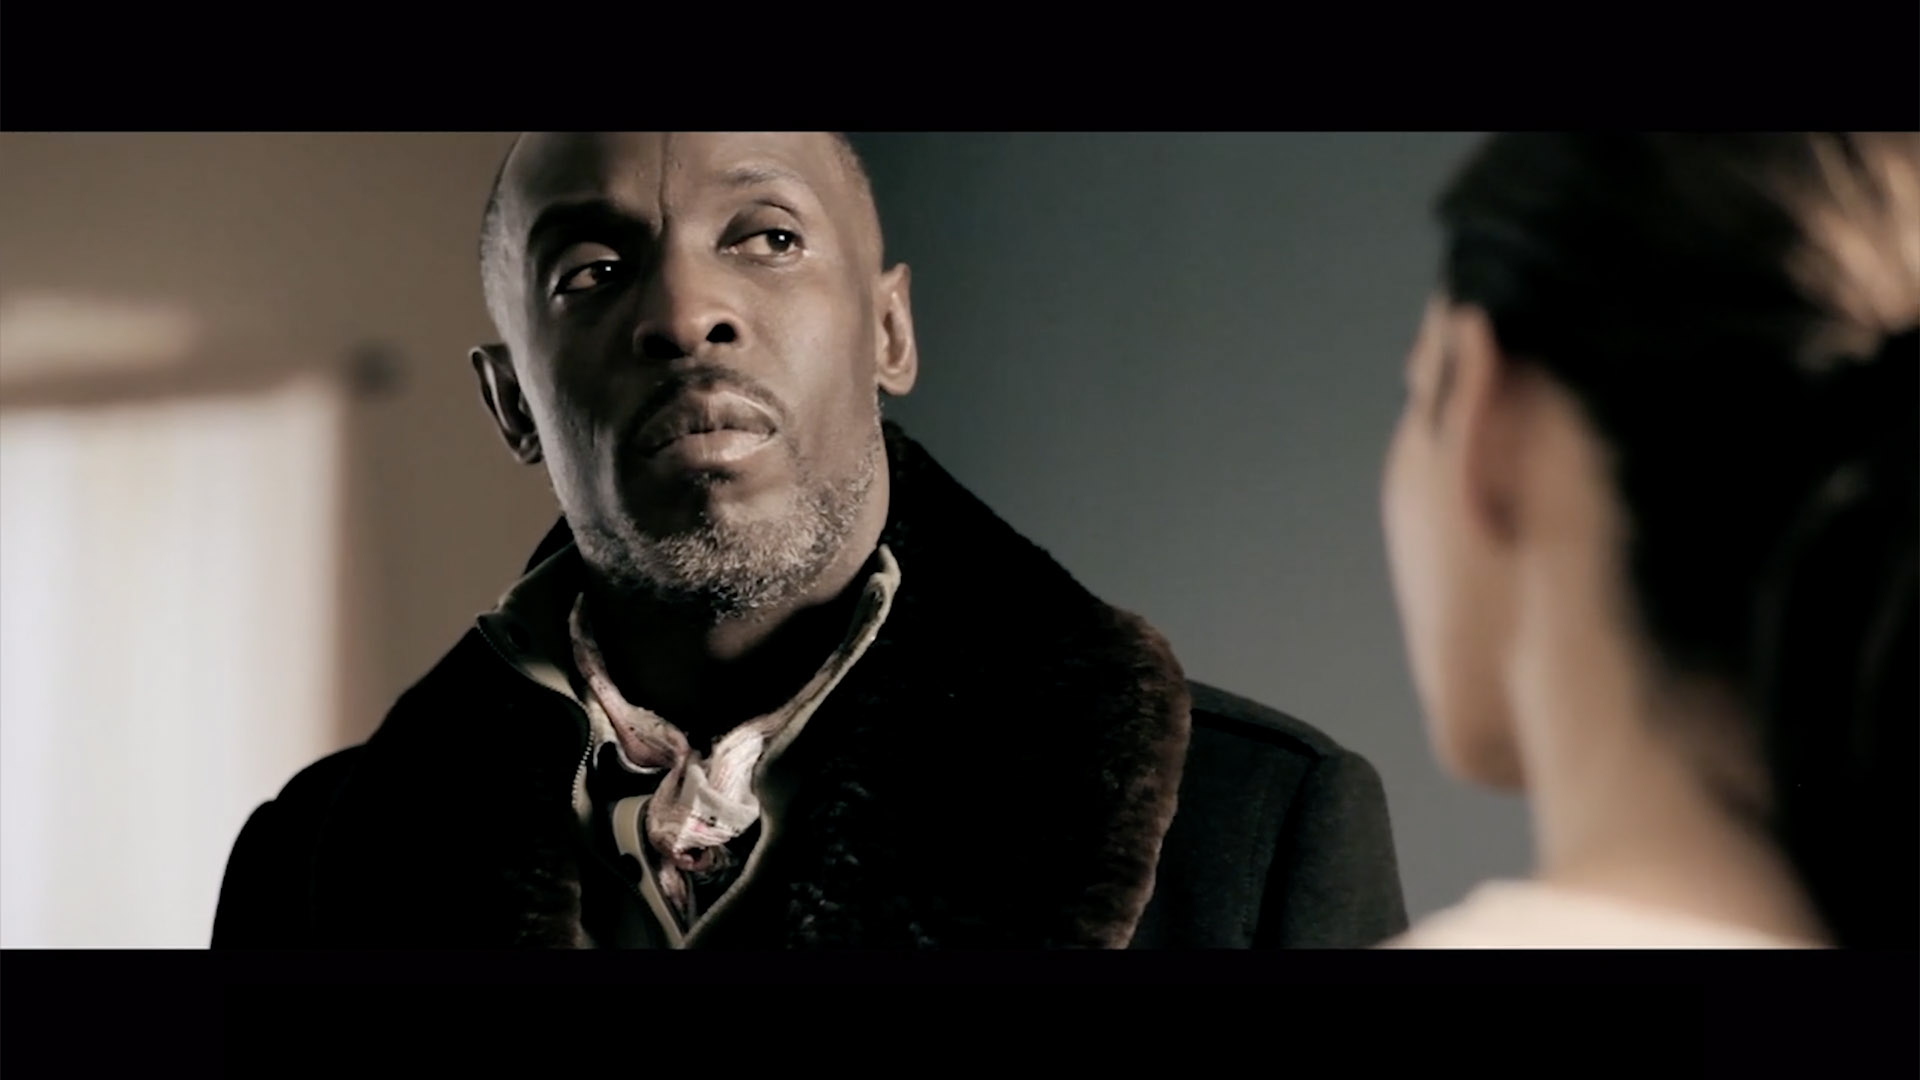 Clayton Combe Director DP frame grab short film